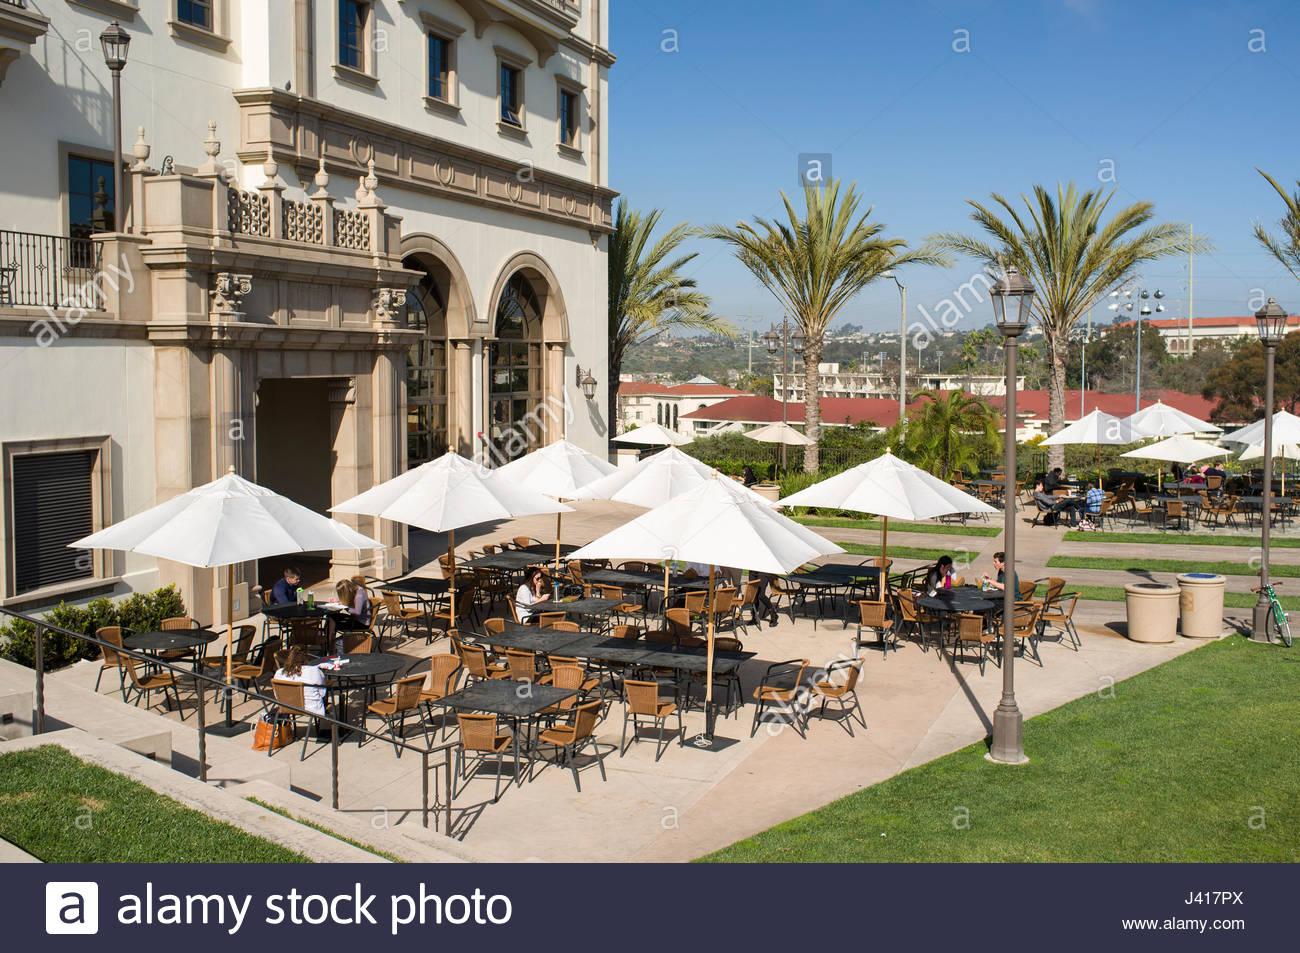 Student Life Pavilion, University of San Diego, San Diego, California, USA - Stock Image